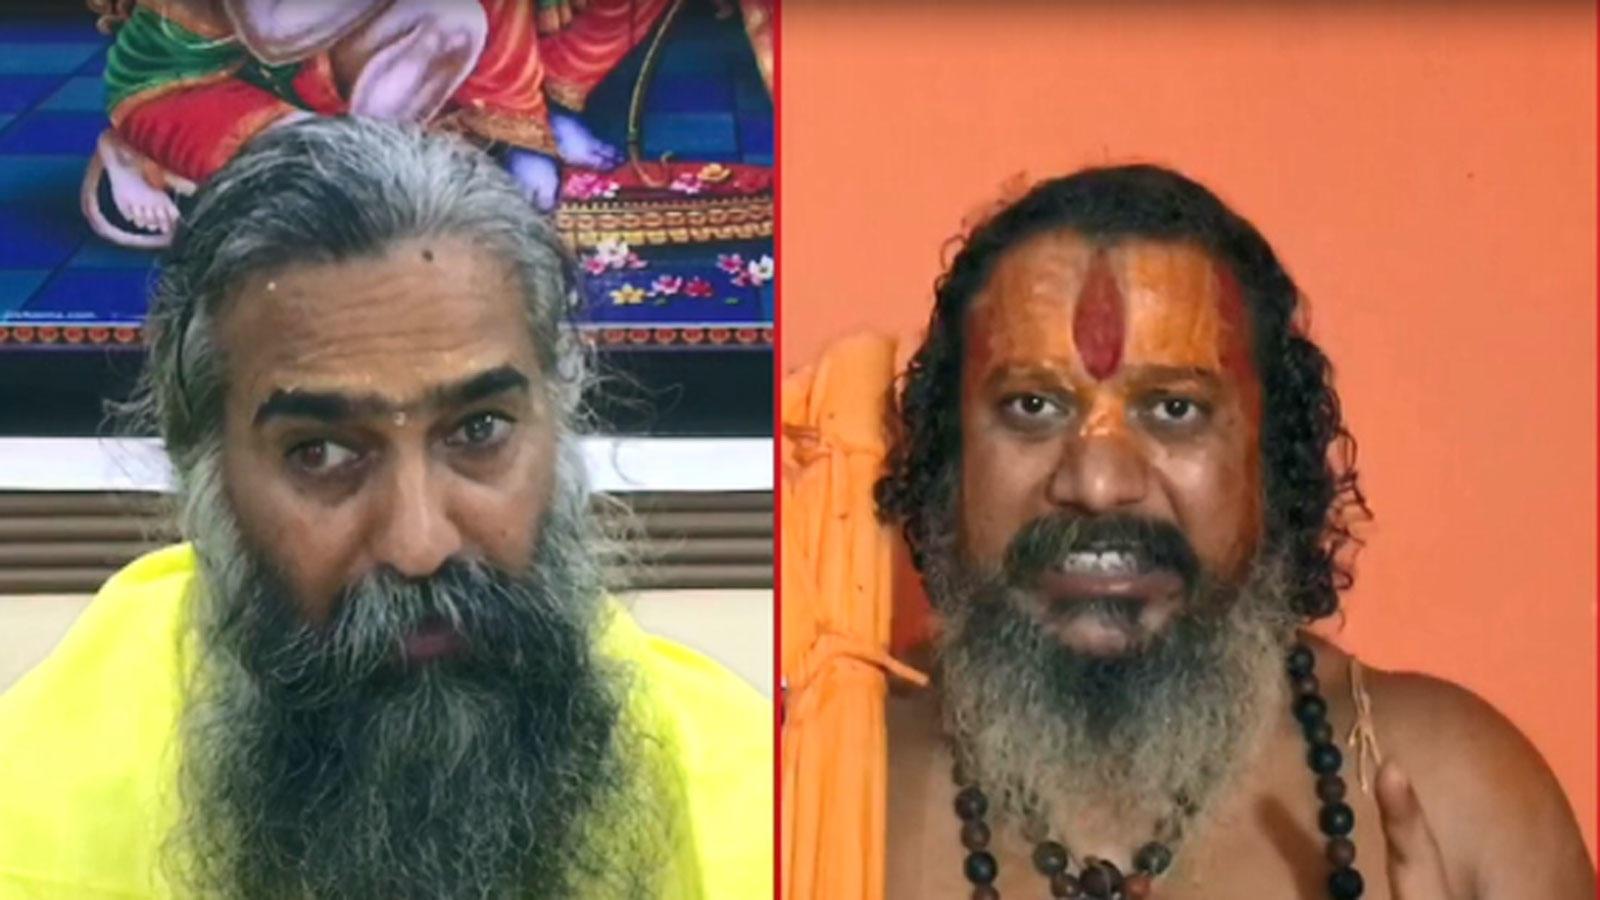 oli-is-insane-ayodhya-priests-condemn-nepal-pms-bizarre-claims-on-lord-ram